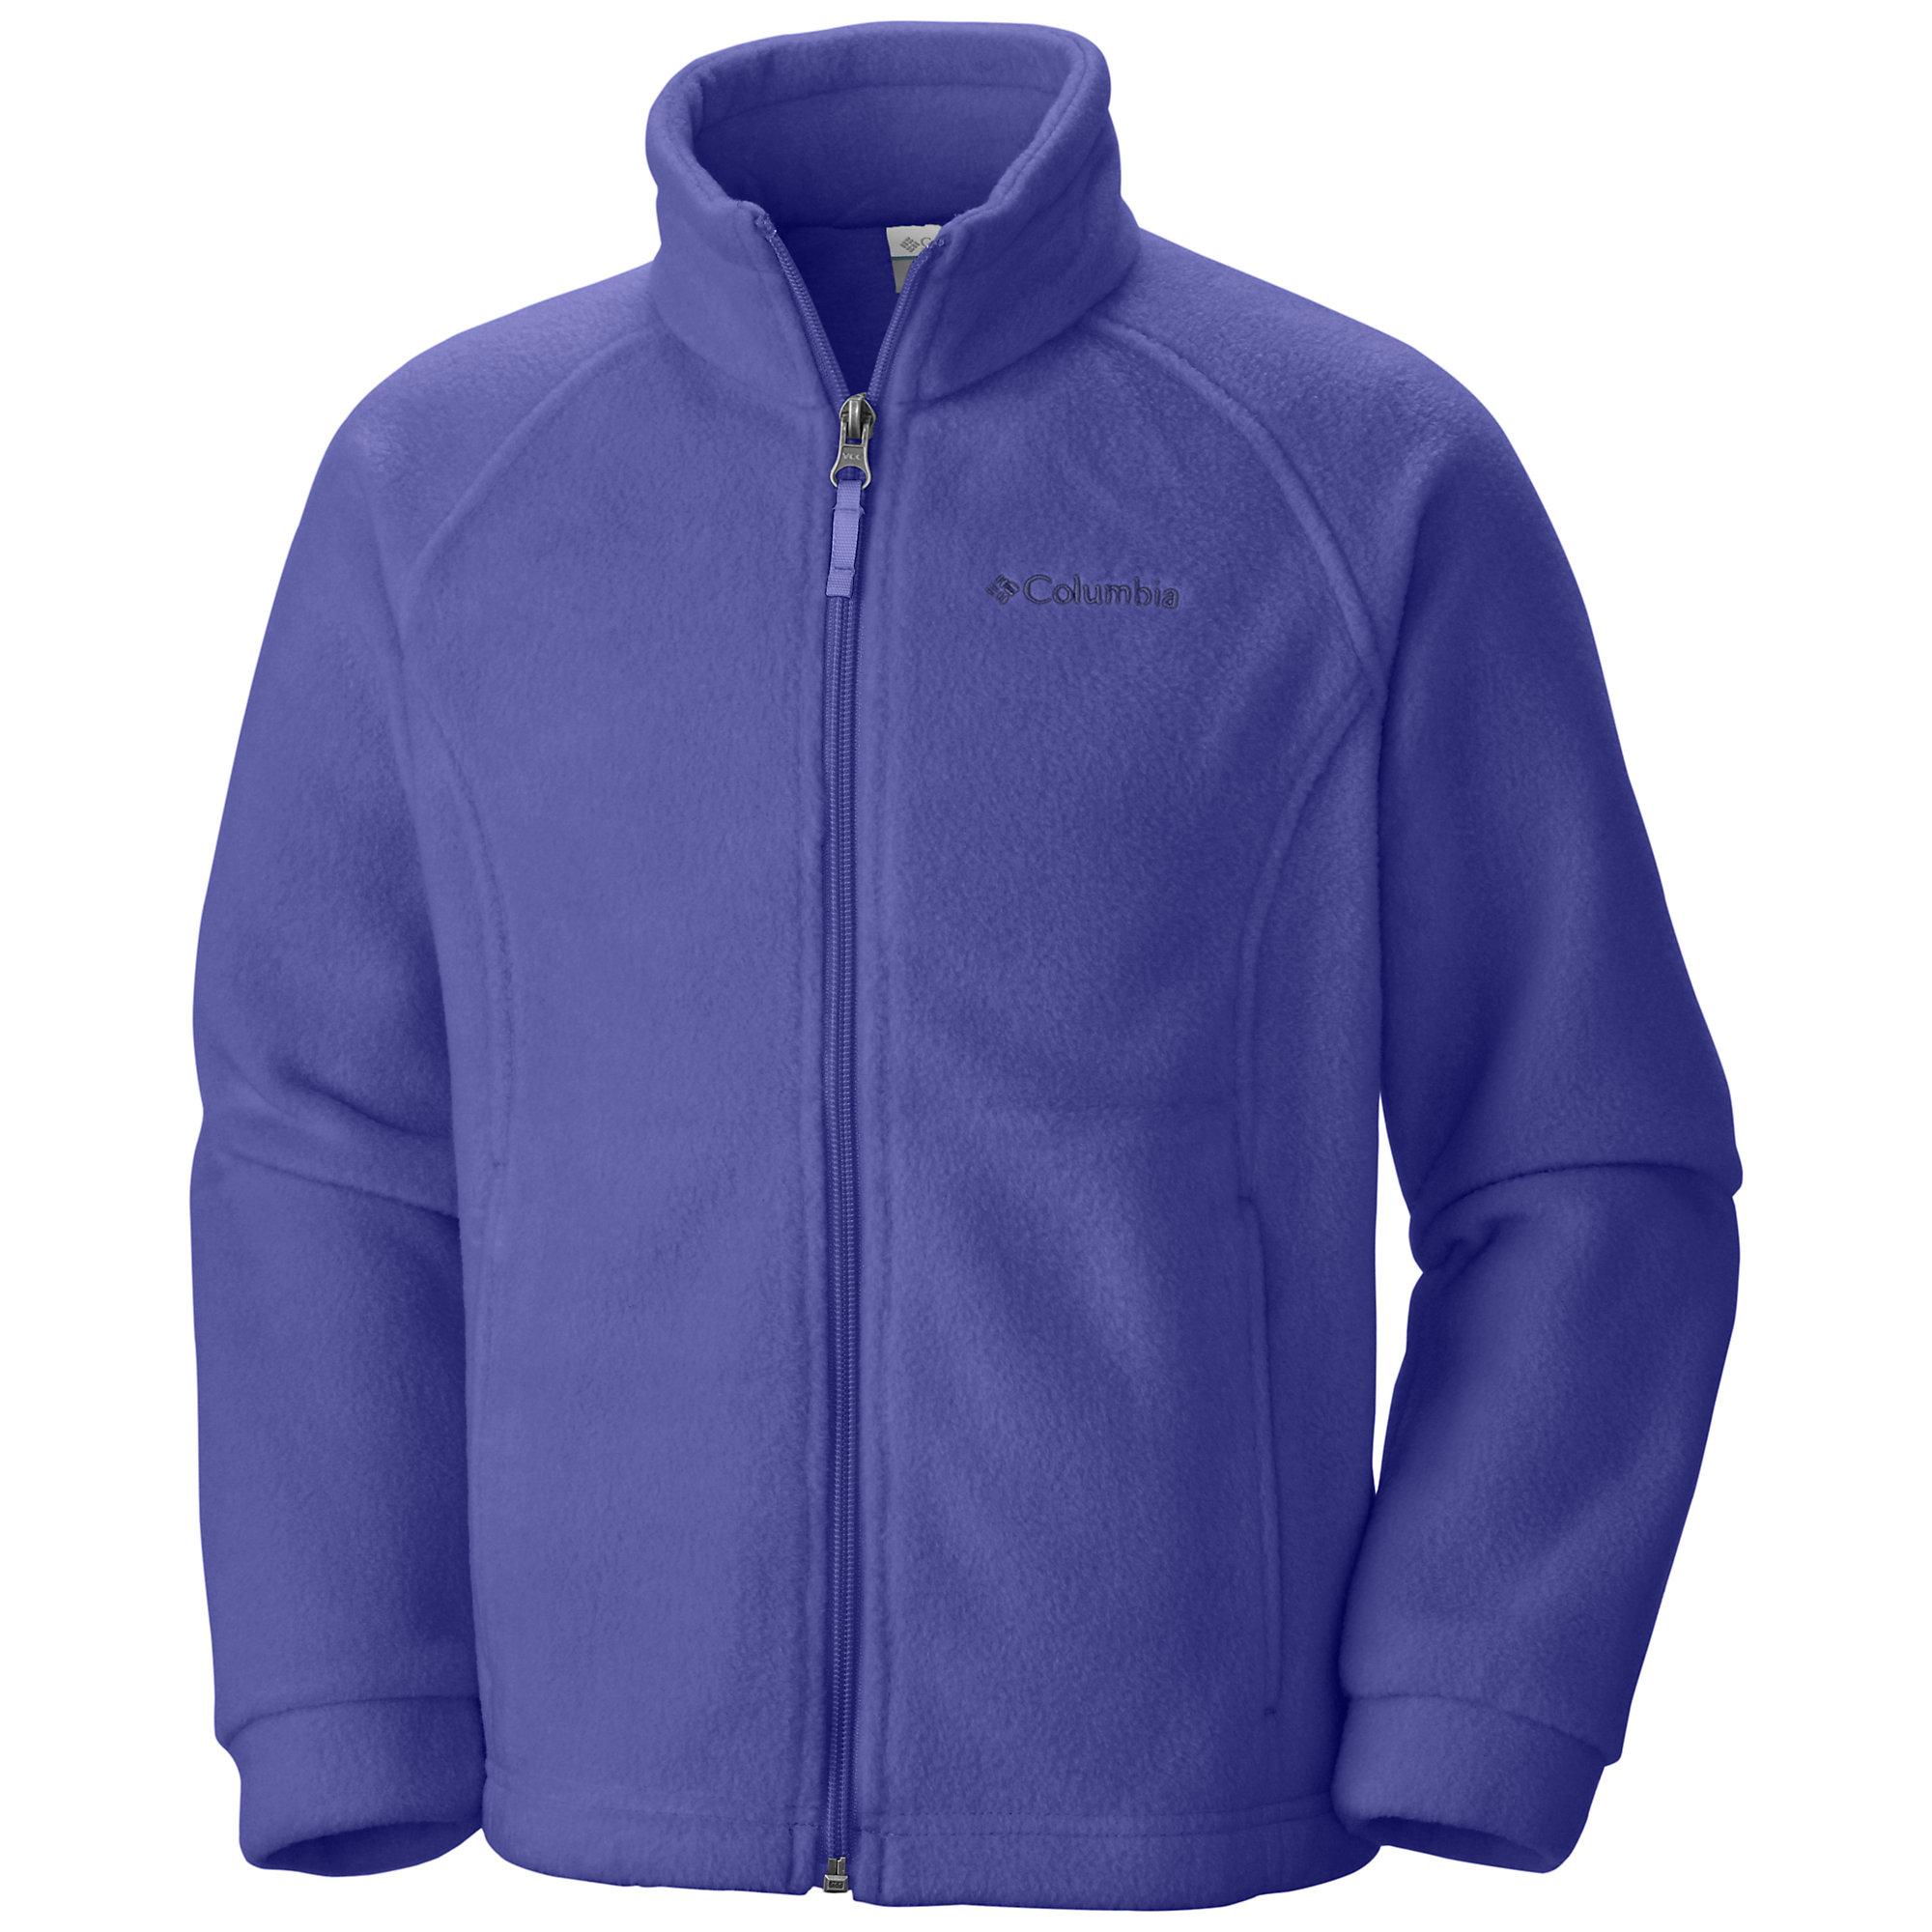 5d02ffcc0 UPC 887253823132 - Columbia Benton Springs Fleece Jacket - Girls ...